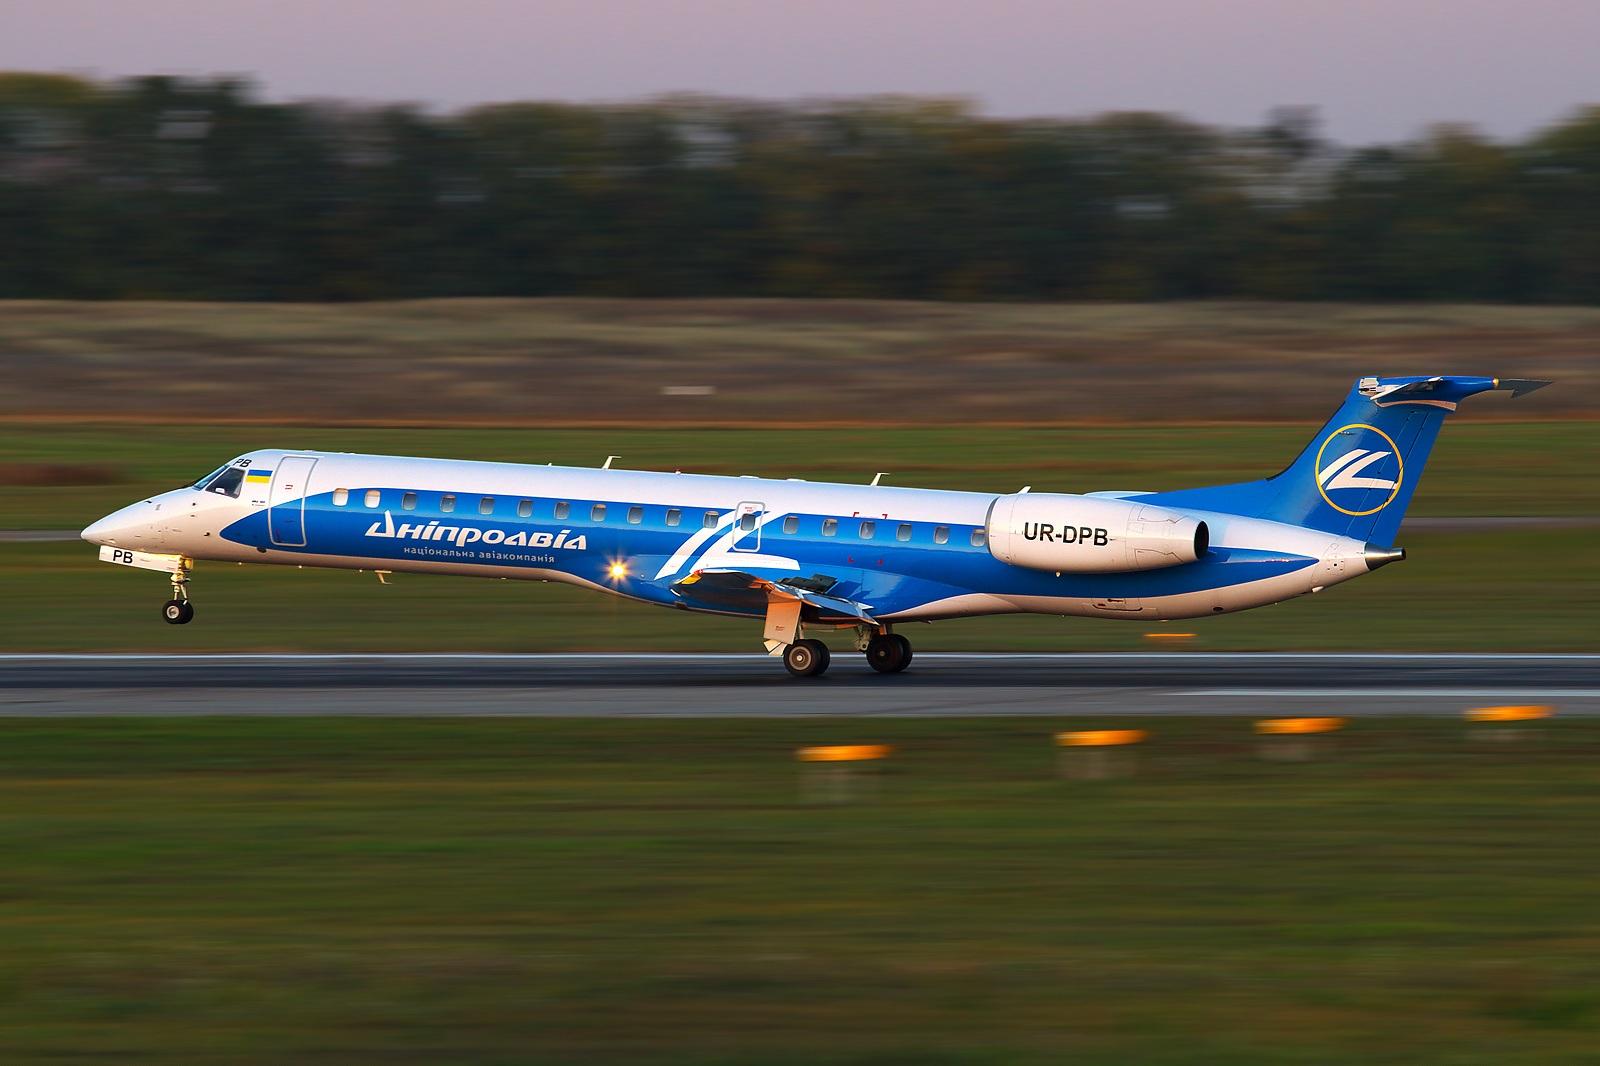 Aviones ERJ 145